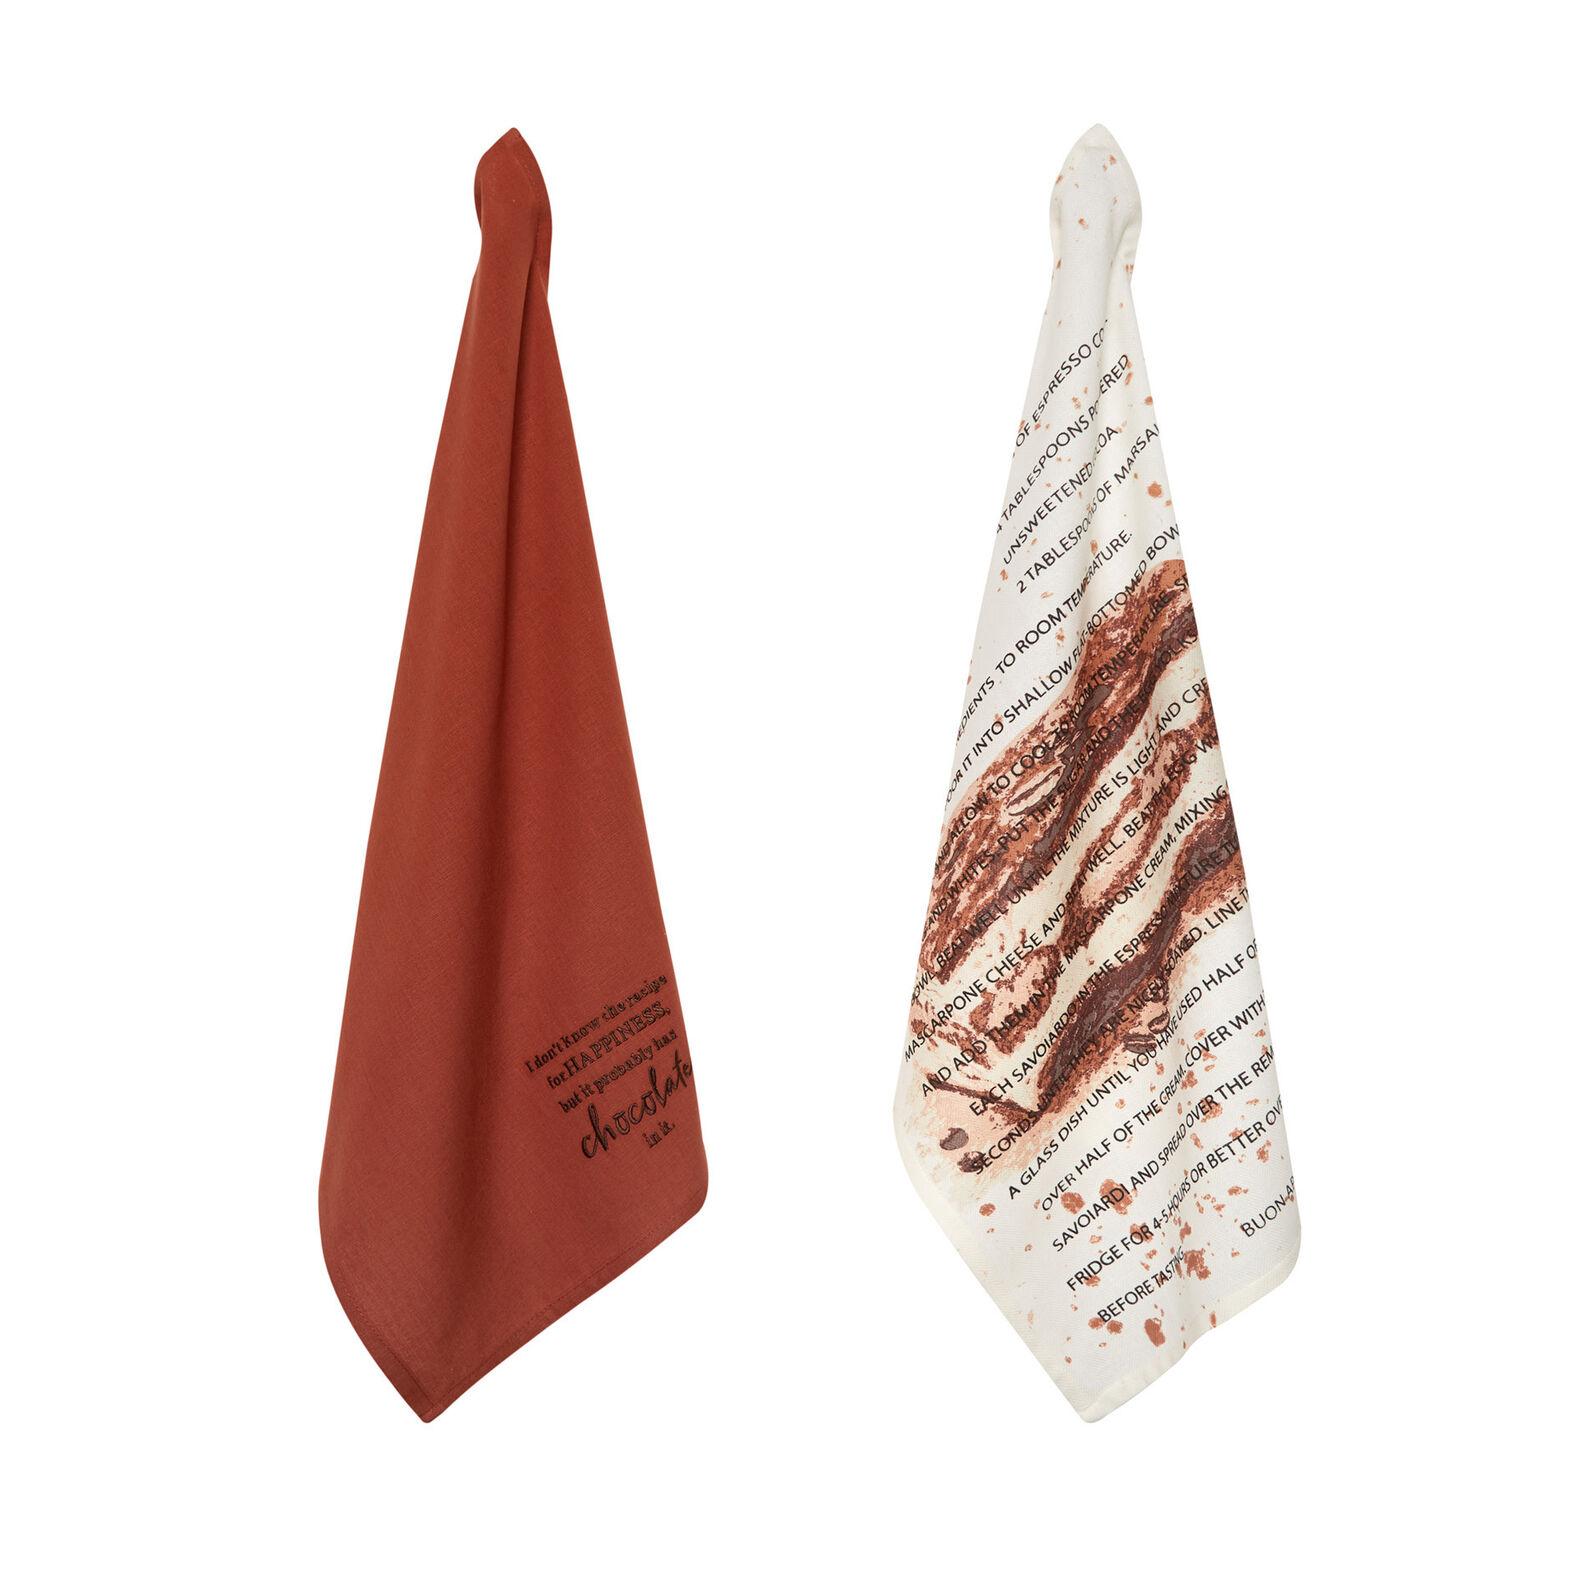 Set of 2 tea towels in 100% cotton with tiramisu print